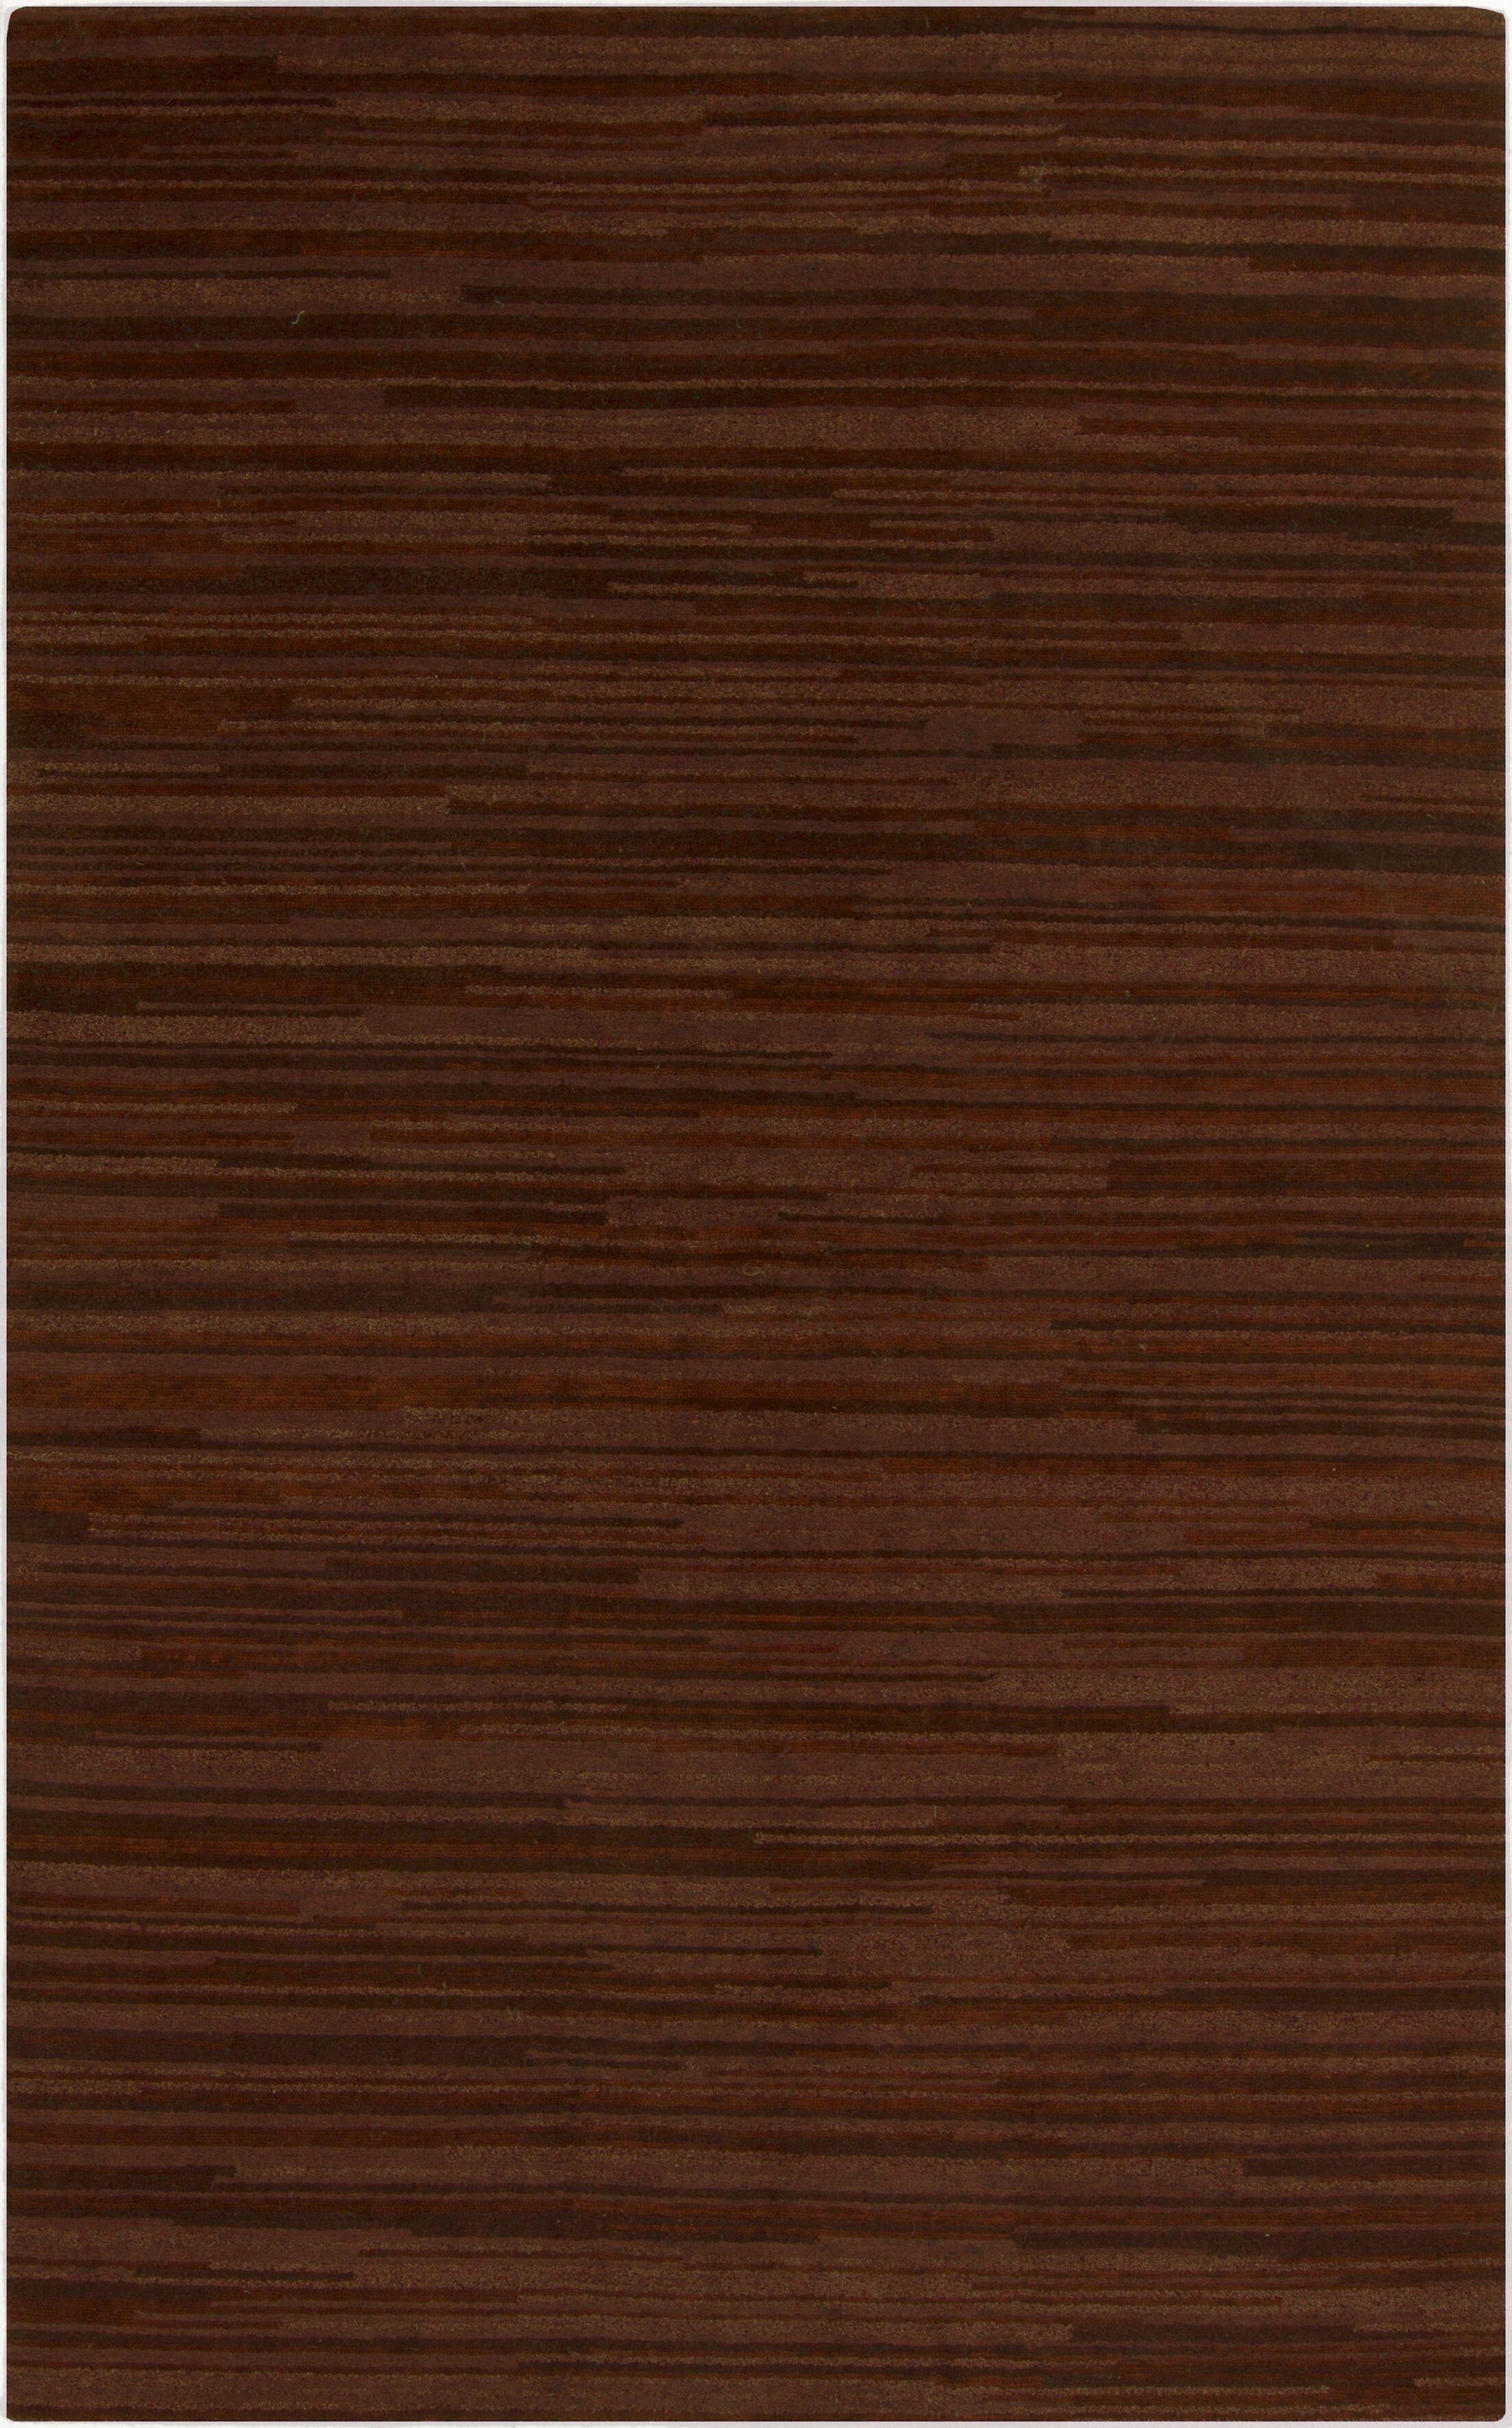 Alica Rust Area Rug Rug Size: Rectangle 8' x 11'